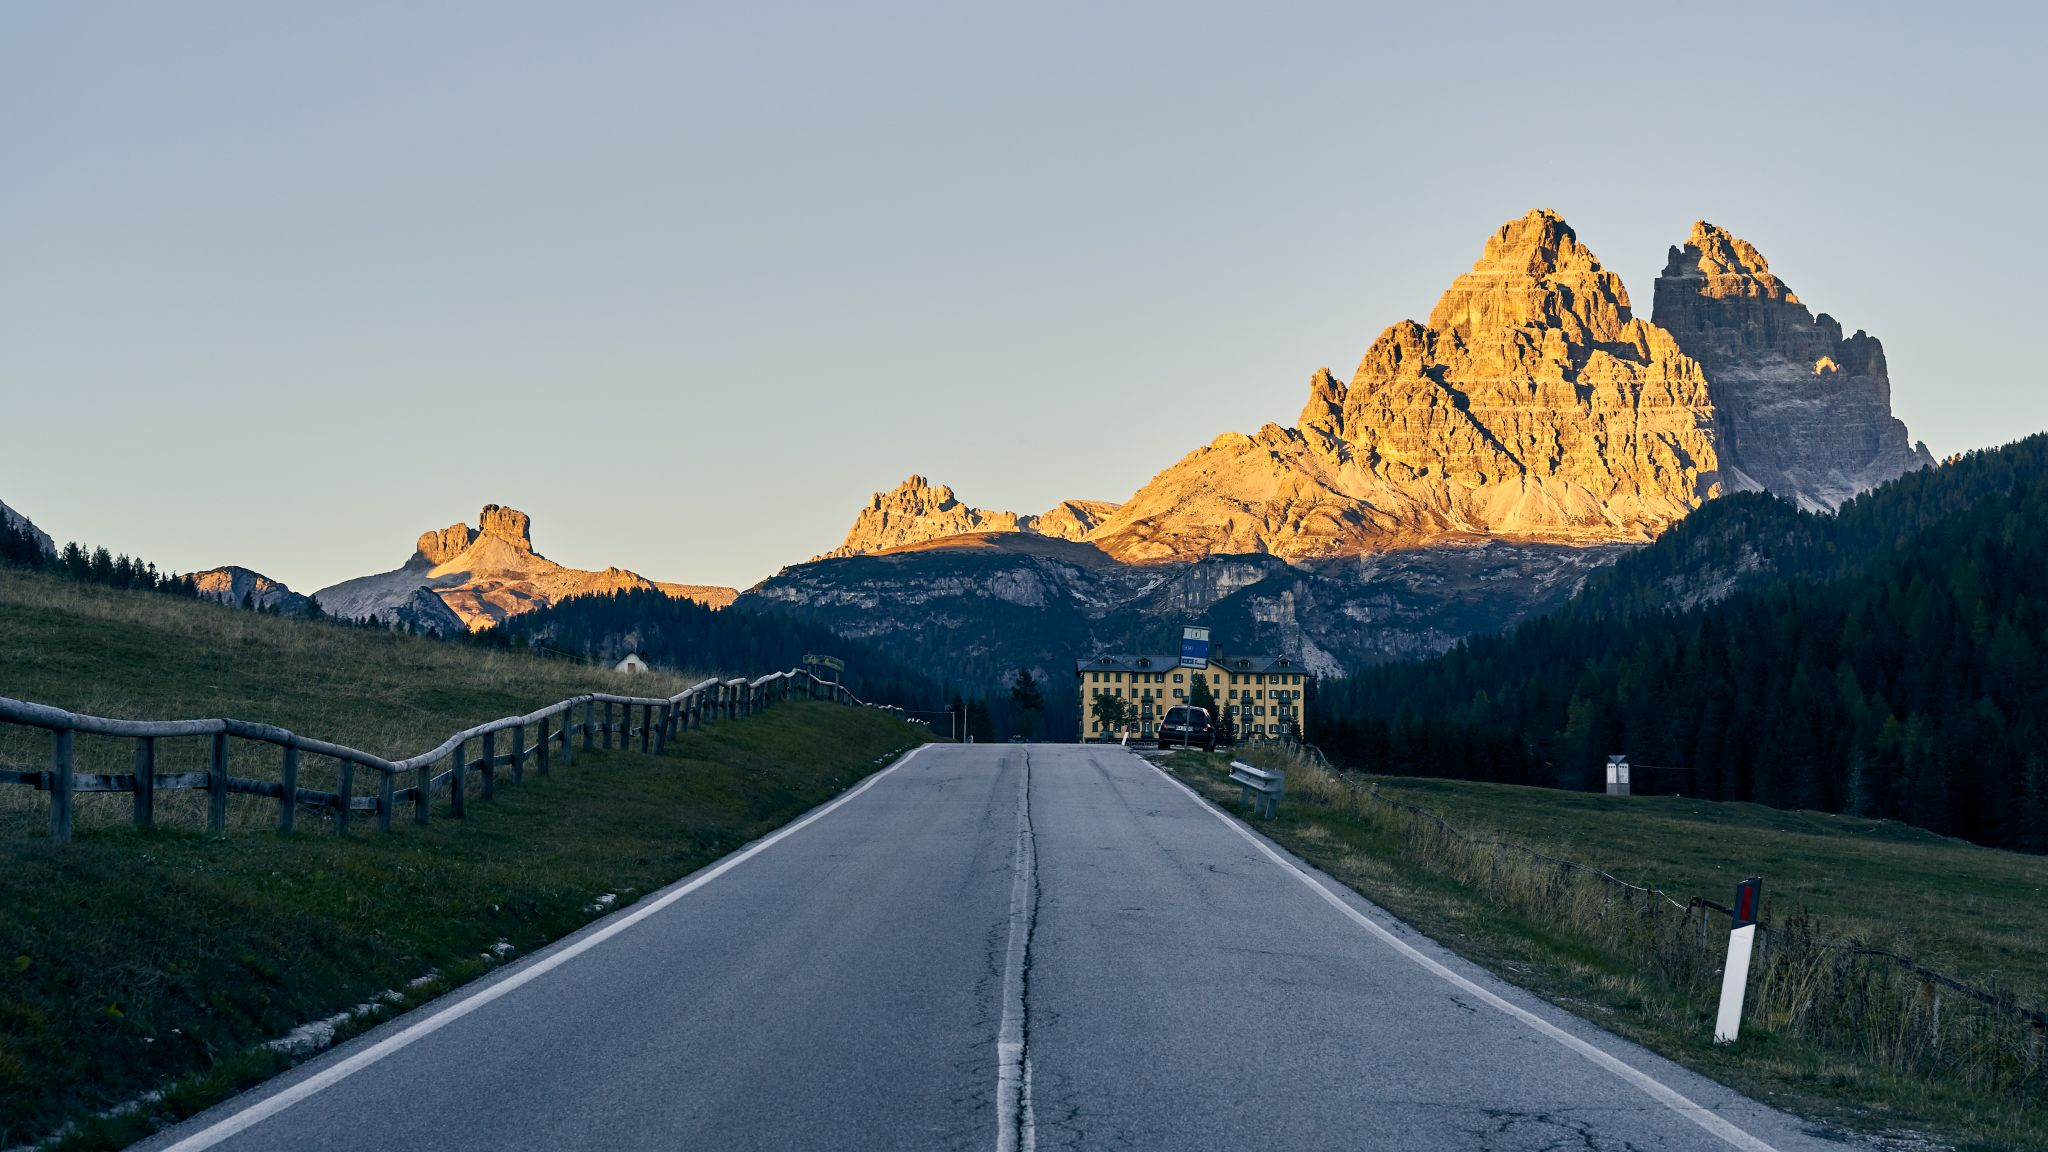 Motorway view near Misurina lake, Italy